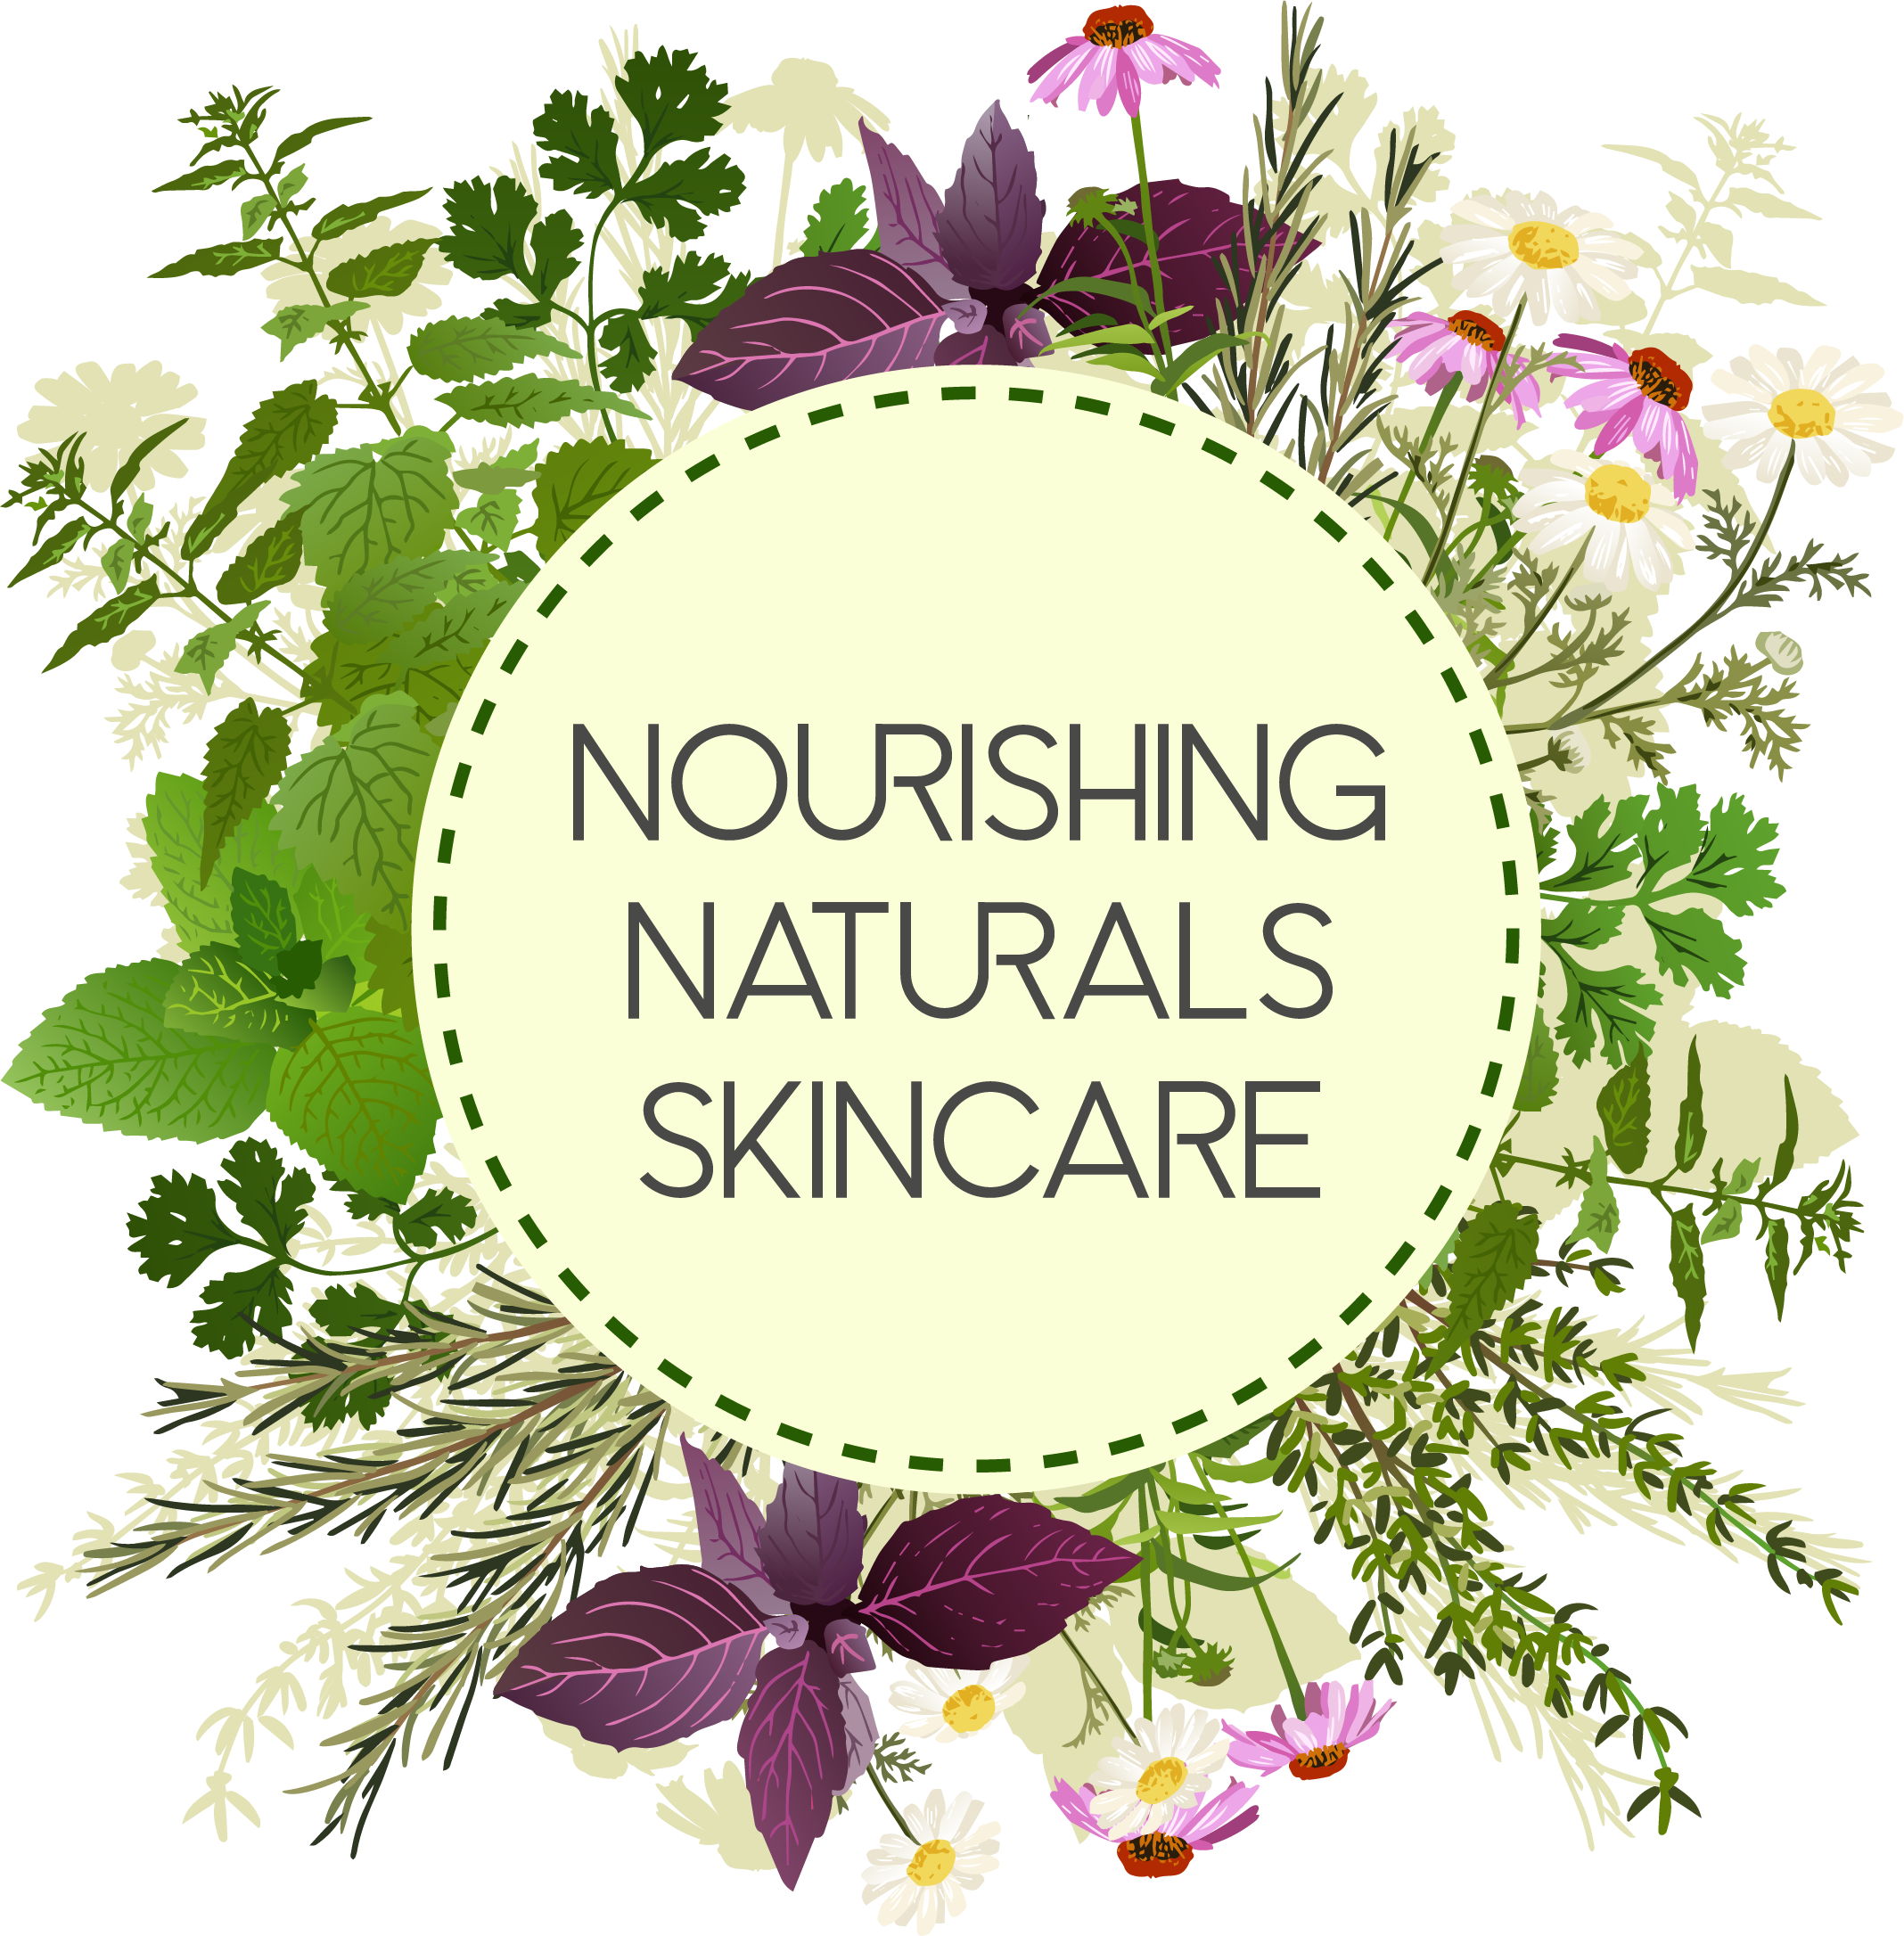 Nourishing Naturals Skincare Logo